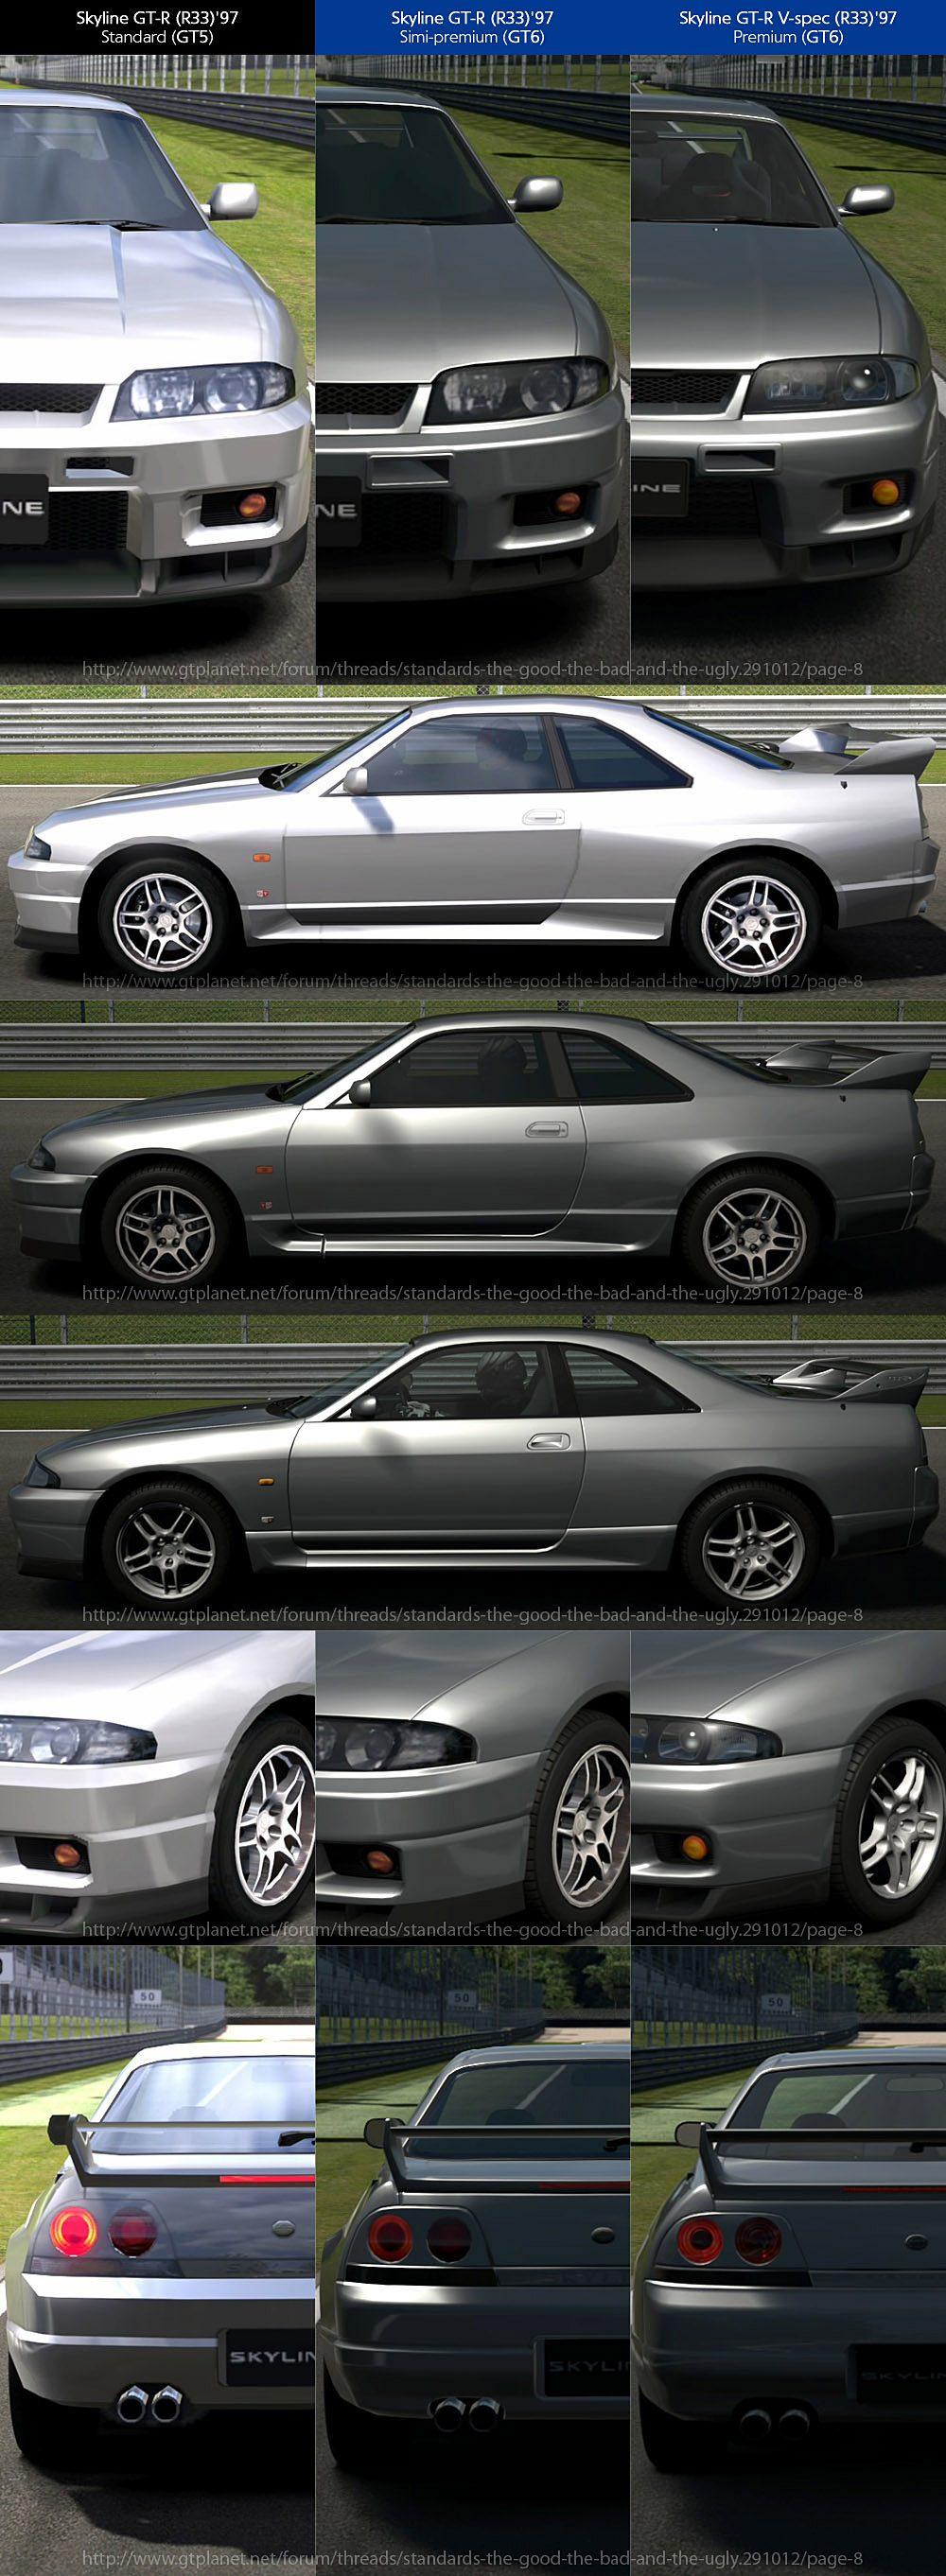 Skyline GT-R (R33)97_s011.jpg